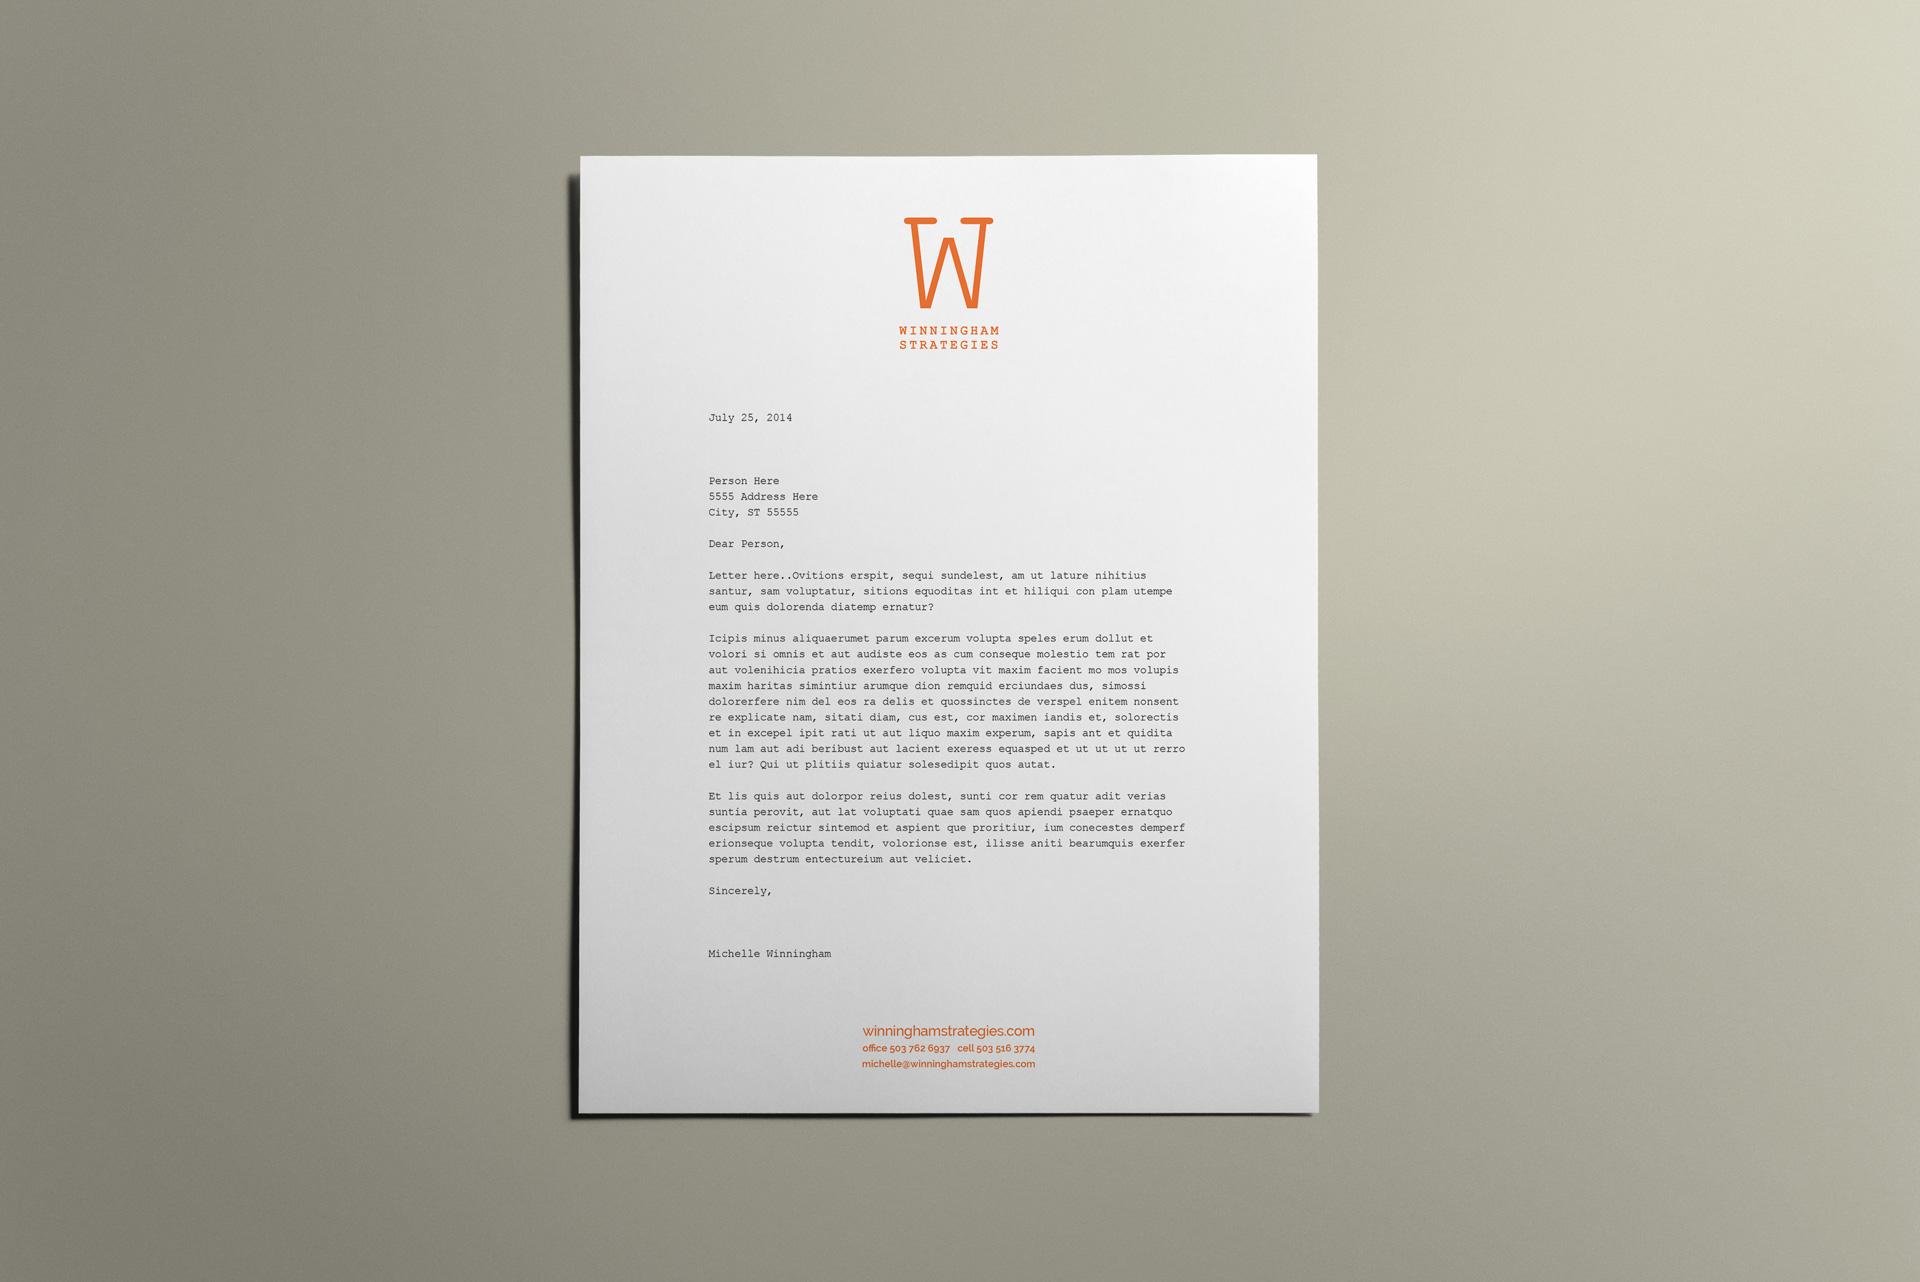 WS_letterhead.jpg